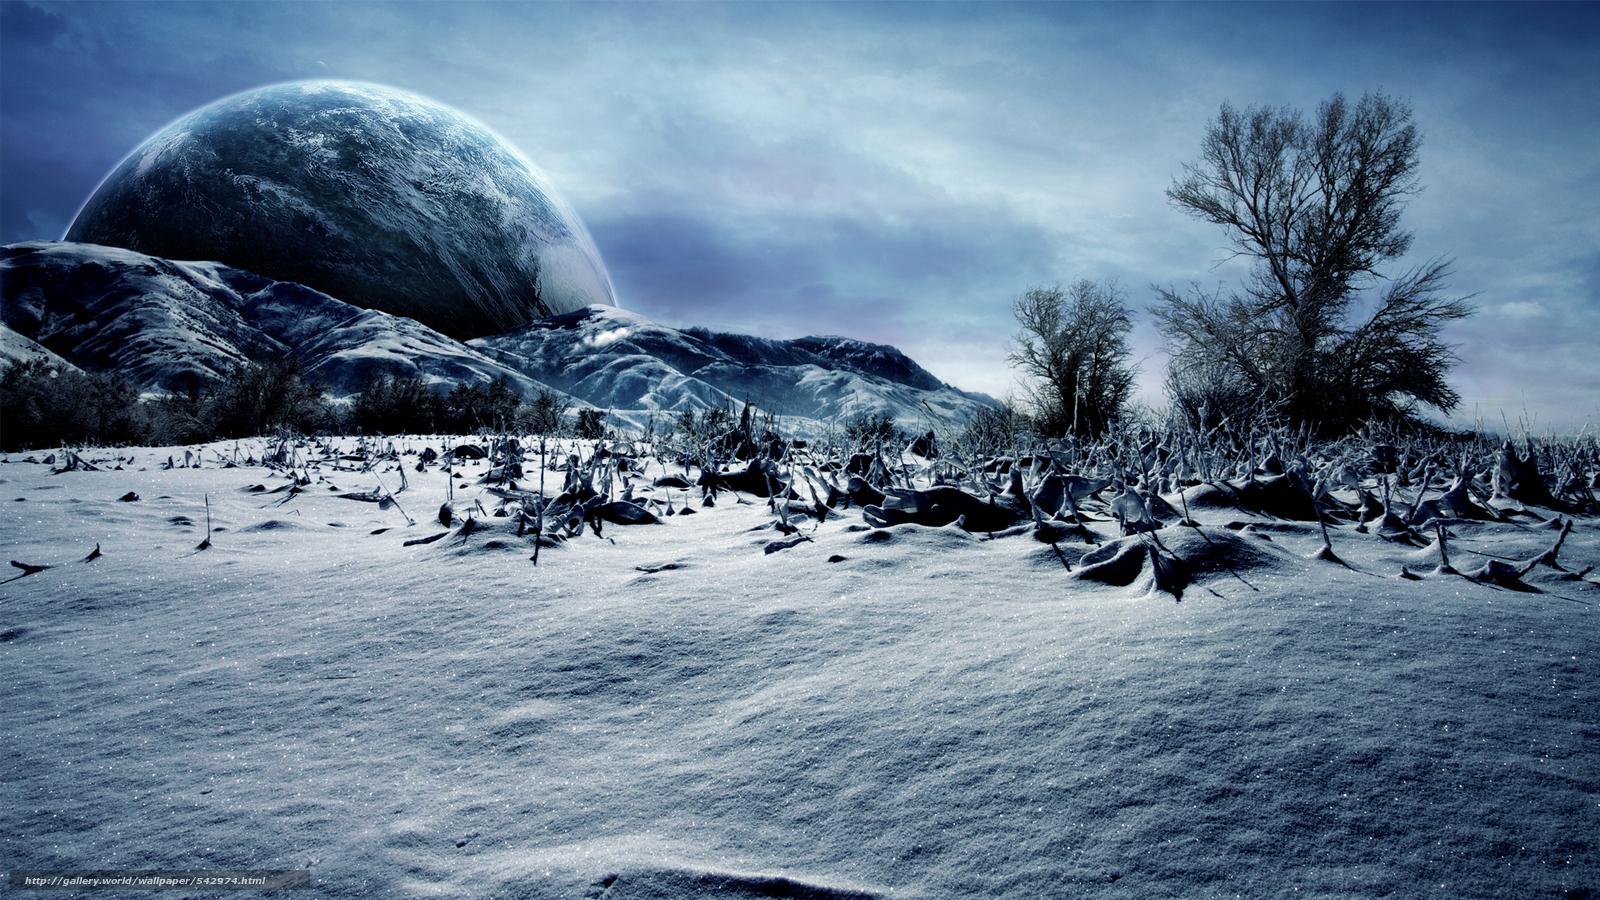 Скачать на телефон обои фото картинку на тему зима, планета, природа, разширение 1920x1080